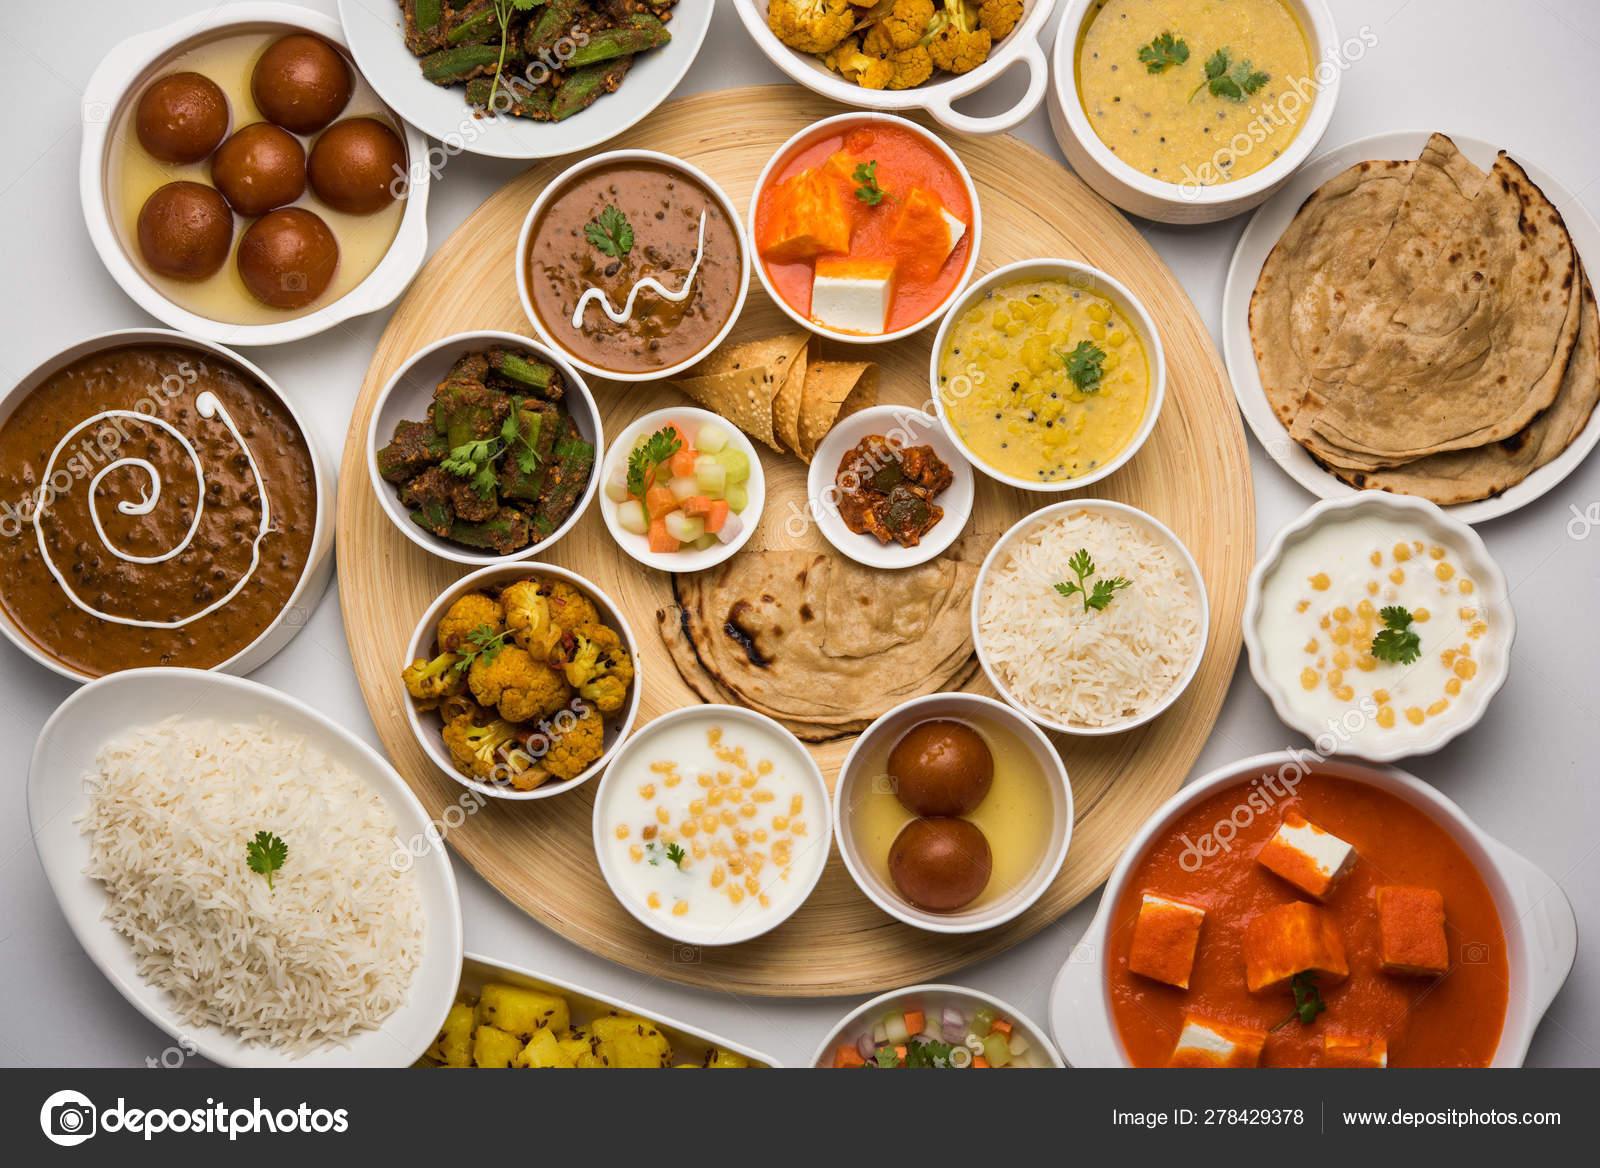 Indian Food Platter Hindu Veg Thali Selective Focus Stock Photo Image By C Arundhati Callistainteriors In 278429378